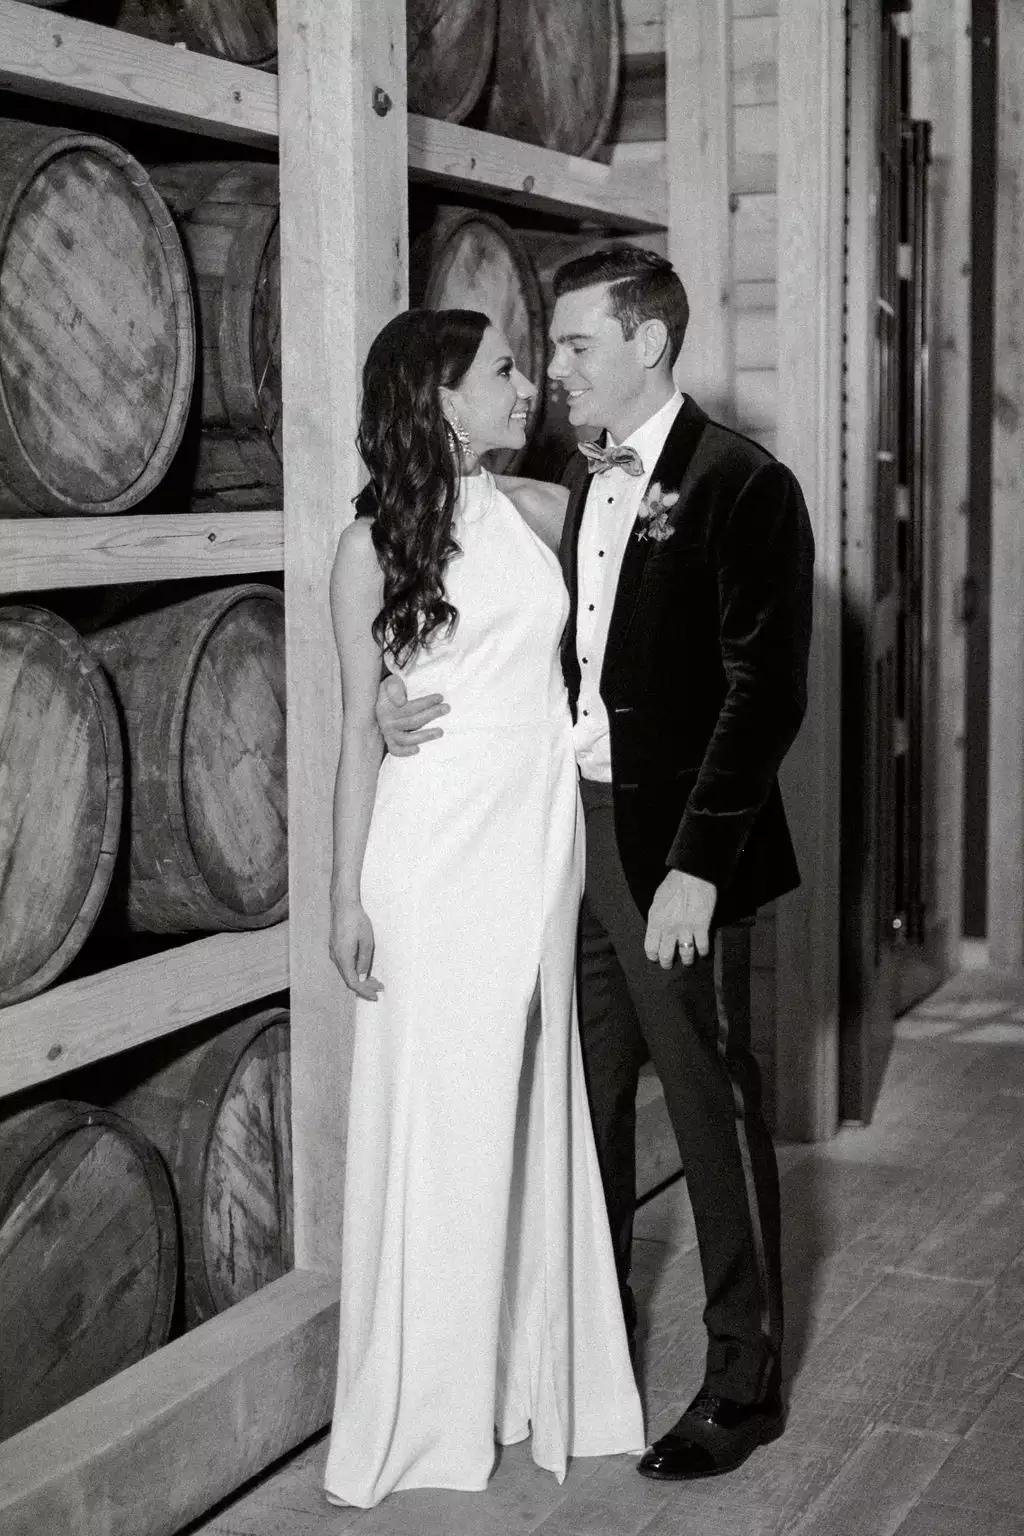 EXZz06wyAN4 - Как найти веселого ведущего на свою свадьбу